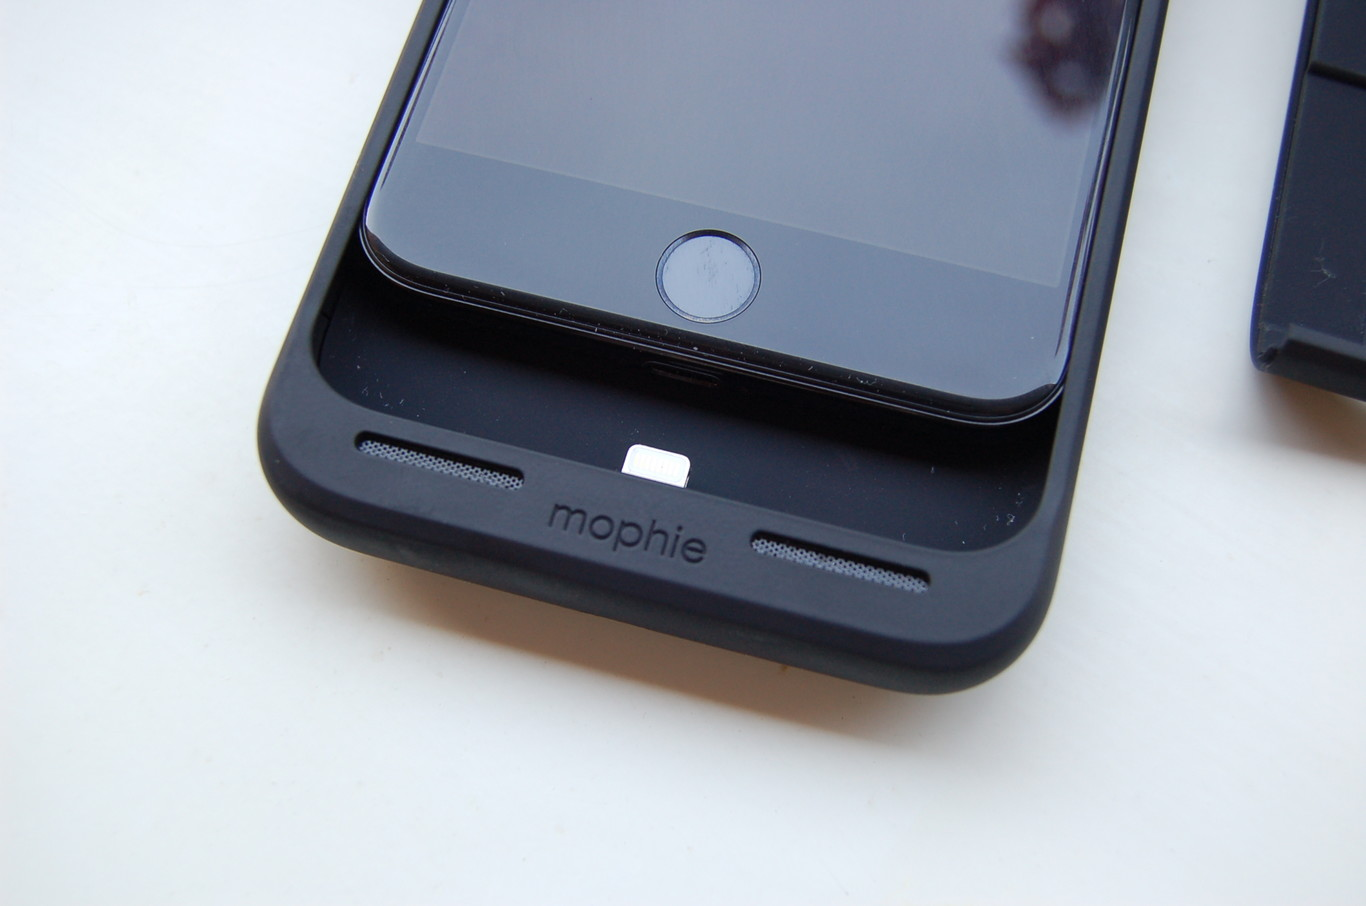 f9f3c7e38df Juice Pack Air de Mophie para iPhone 7 Plus: análisis tras una semana de uso